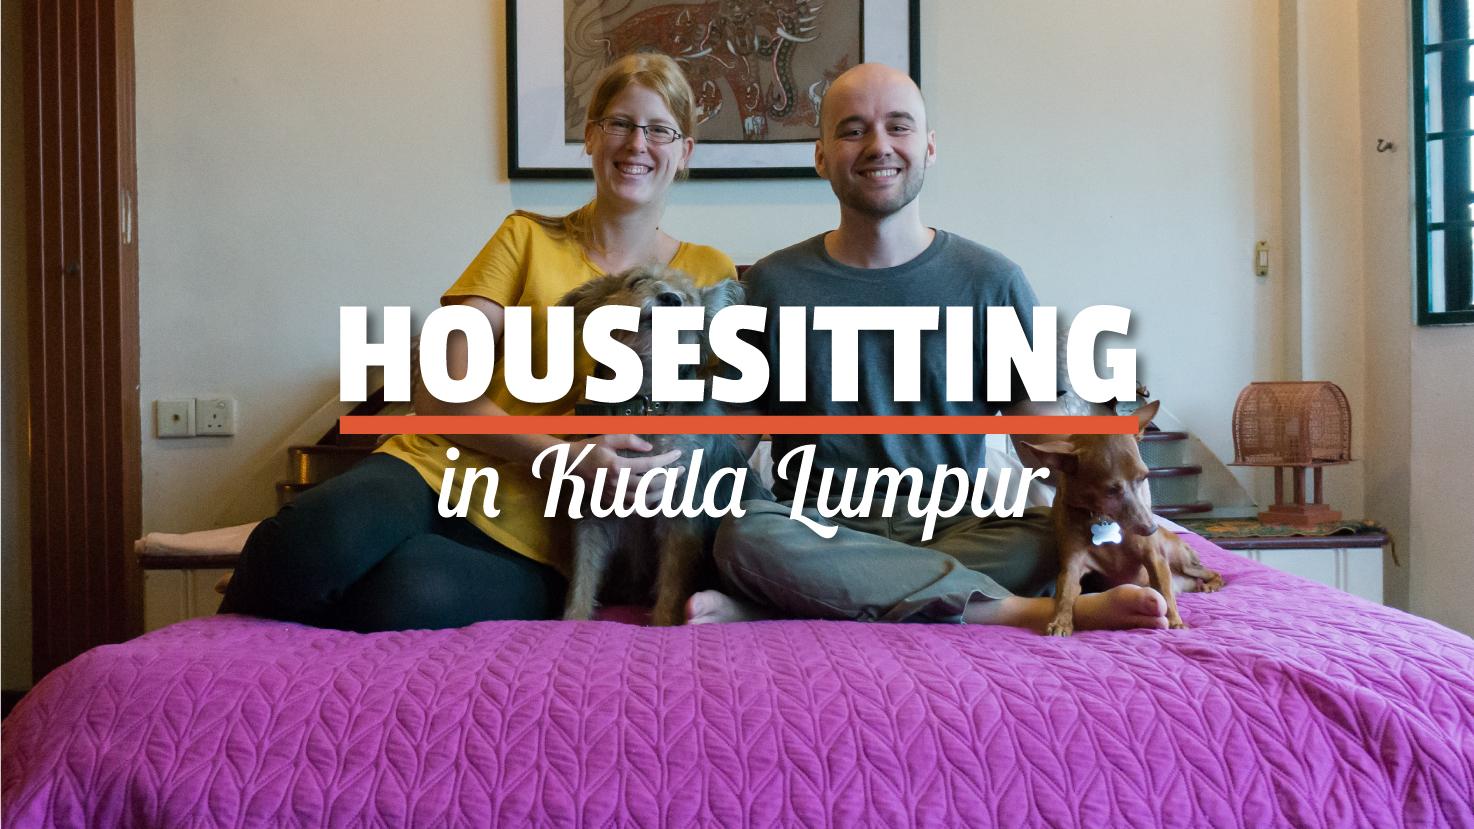 Housesitting in Kuala Lumpur als digitale Nomaden